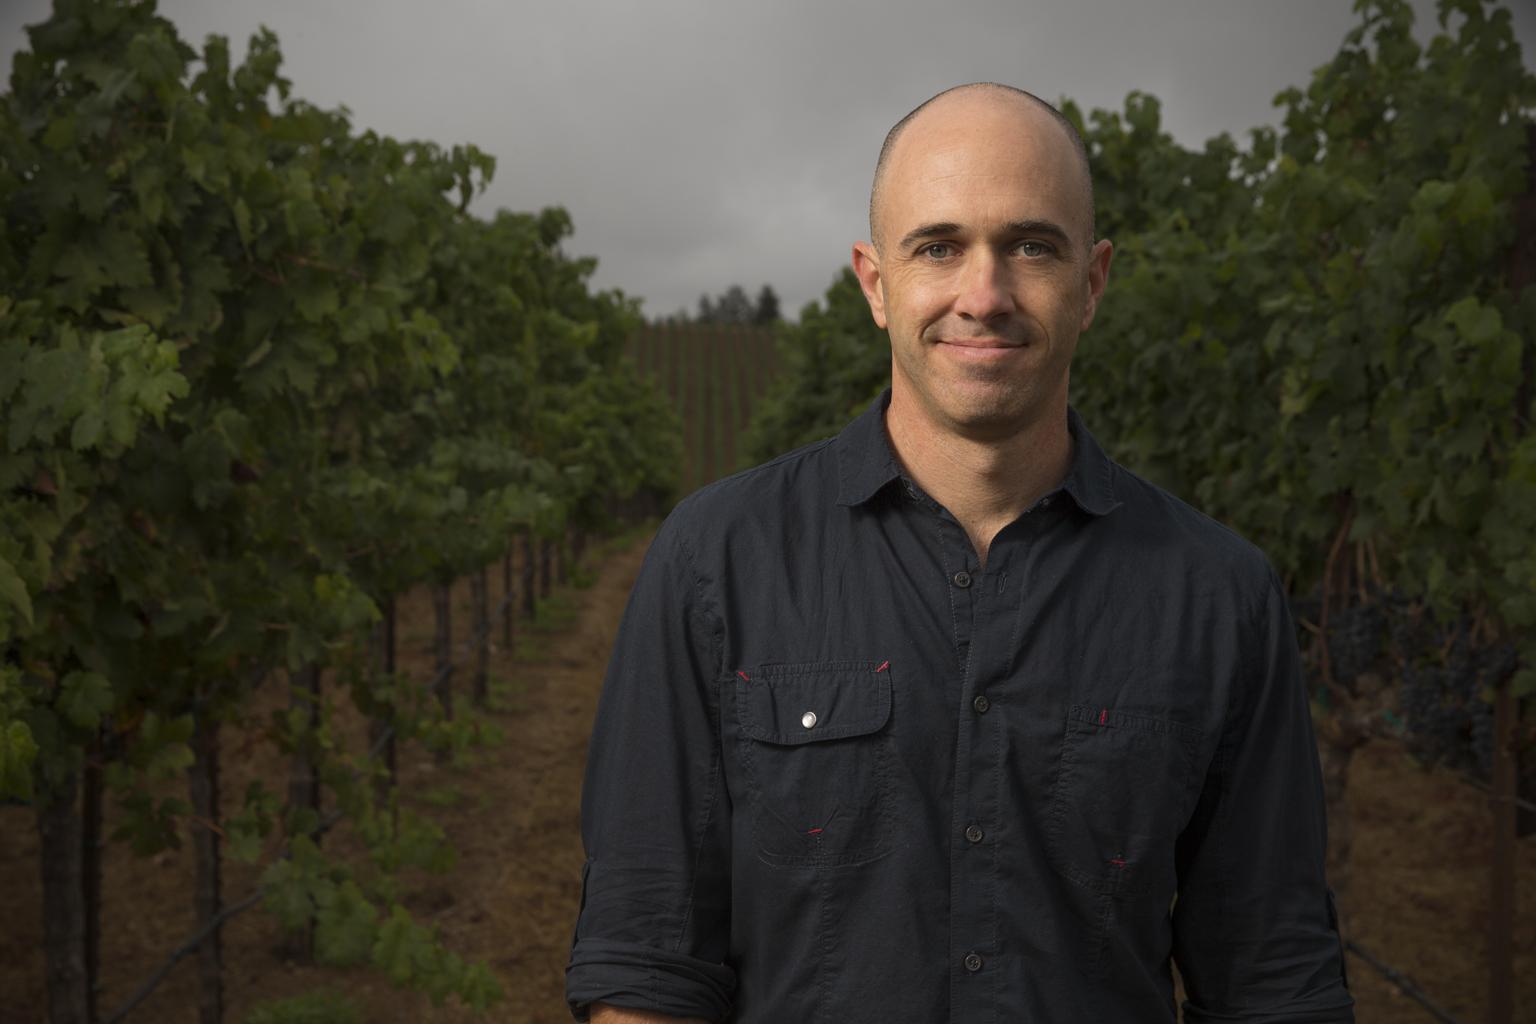 Michael Eddy, Director of Winemaking, Louis M. Martini